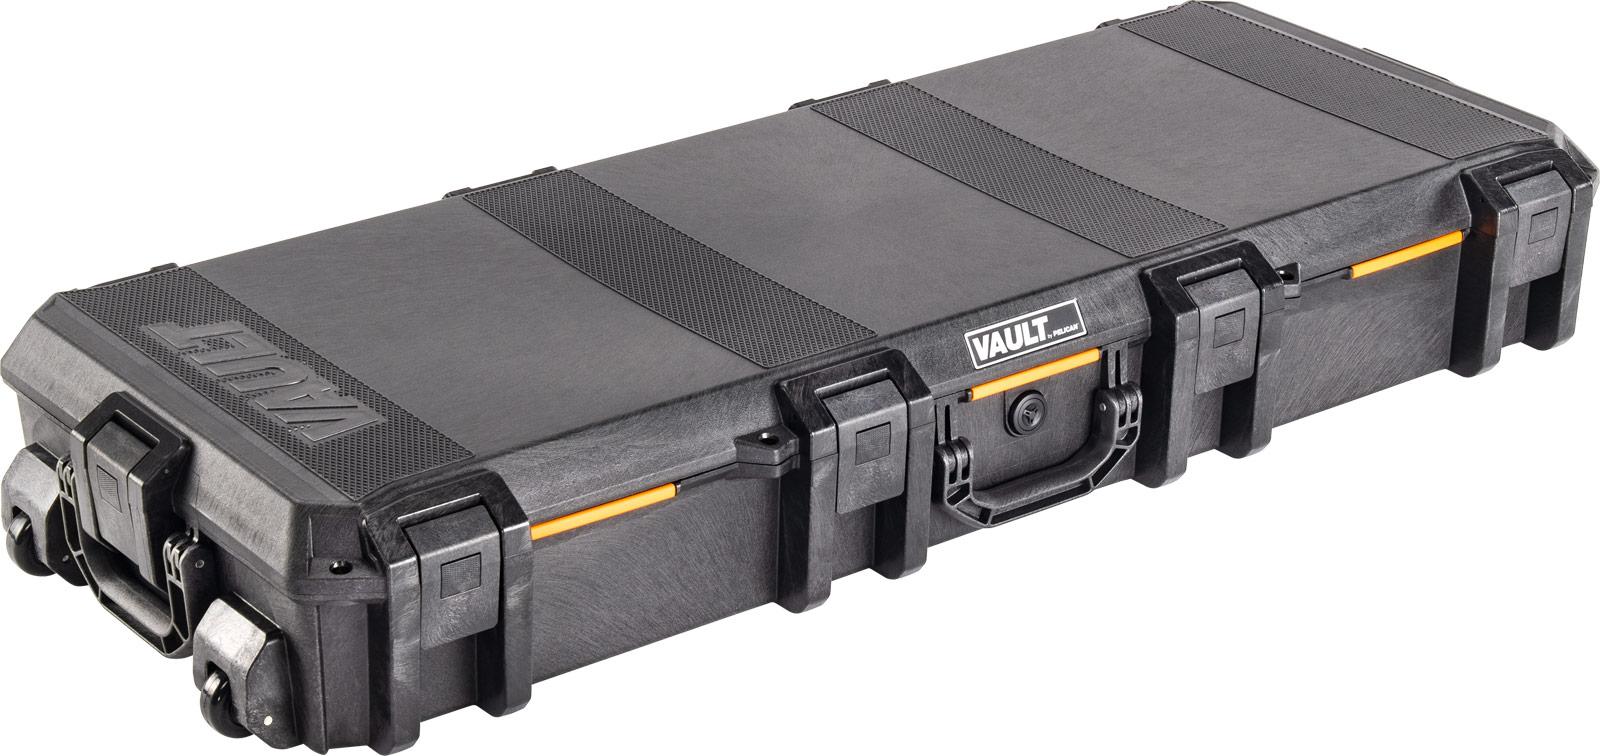 pelican vault v730 gun case